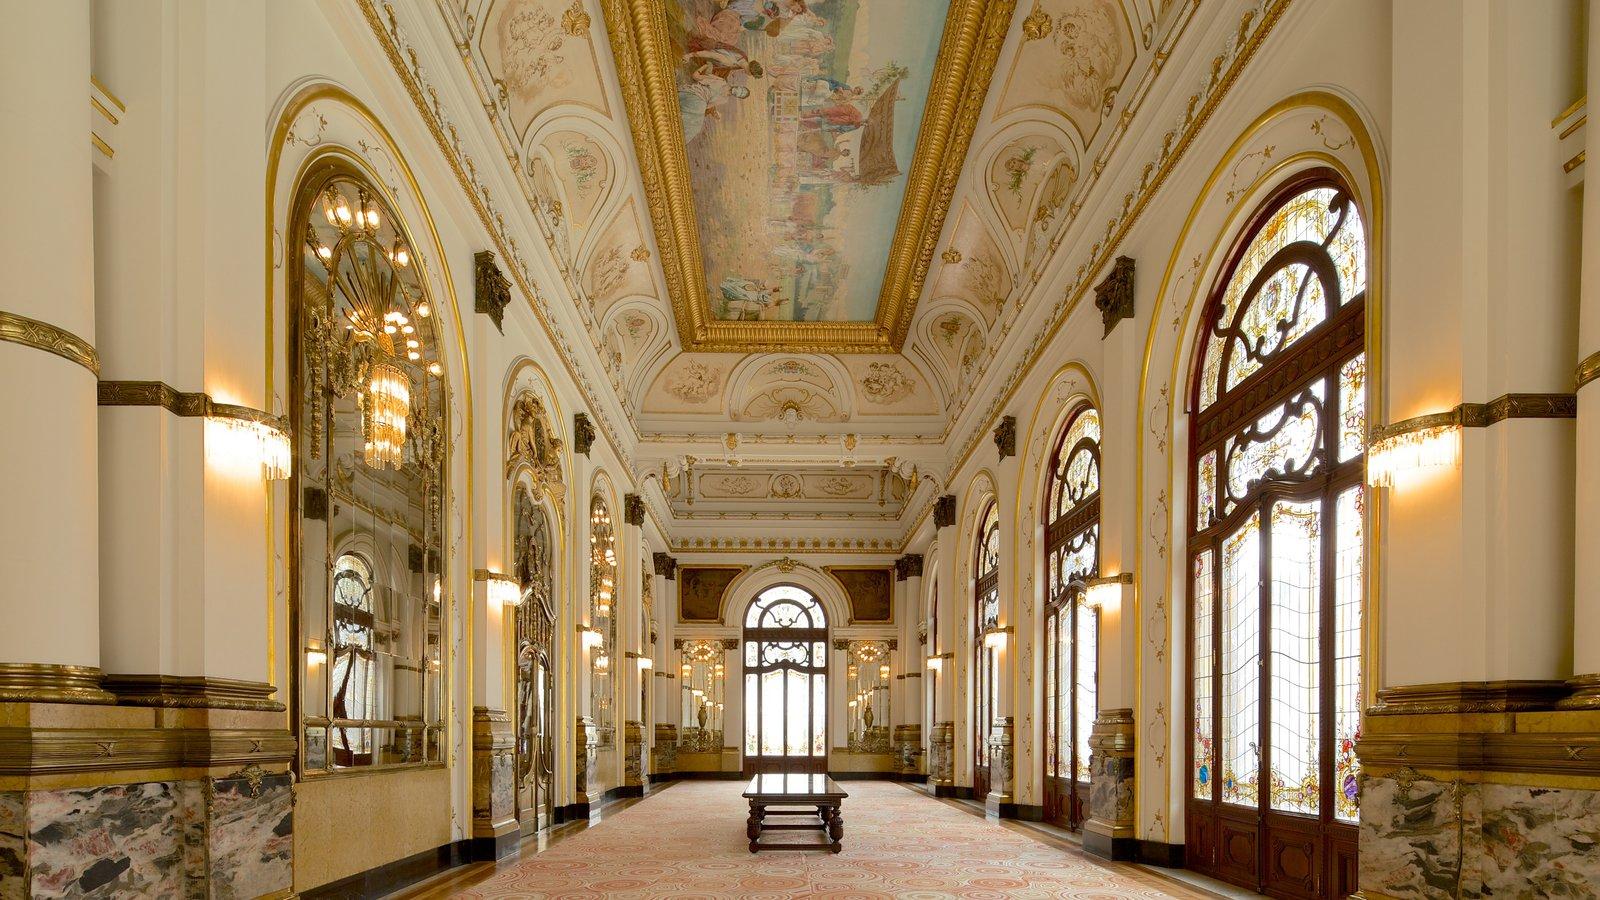 Teatro Municipal caracterizando arquitetura de patrimônio, cenas de teatro e vistas internas